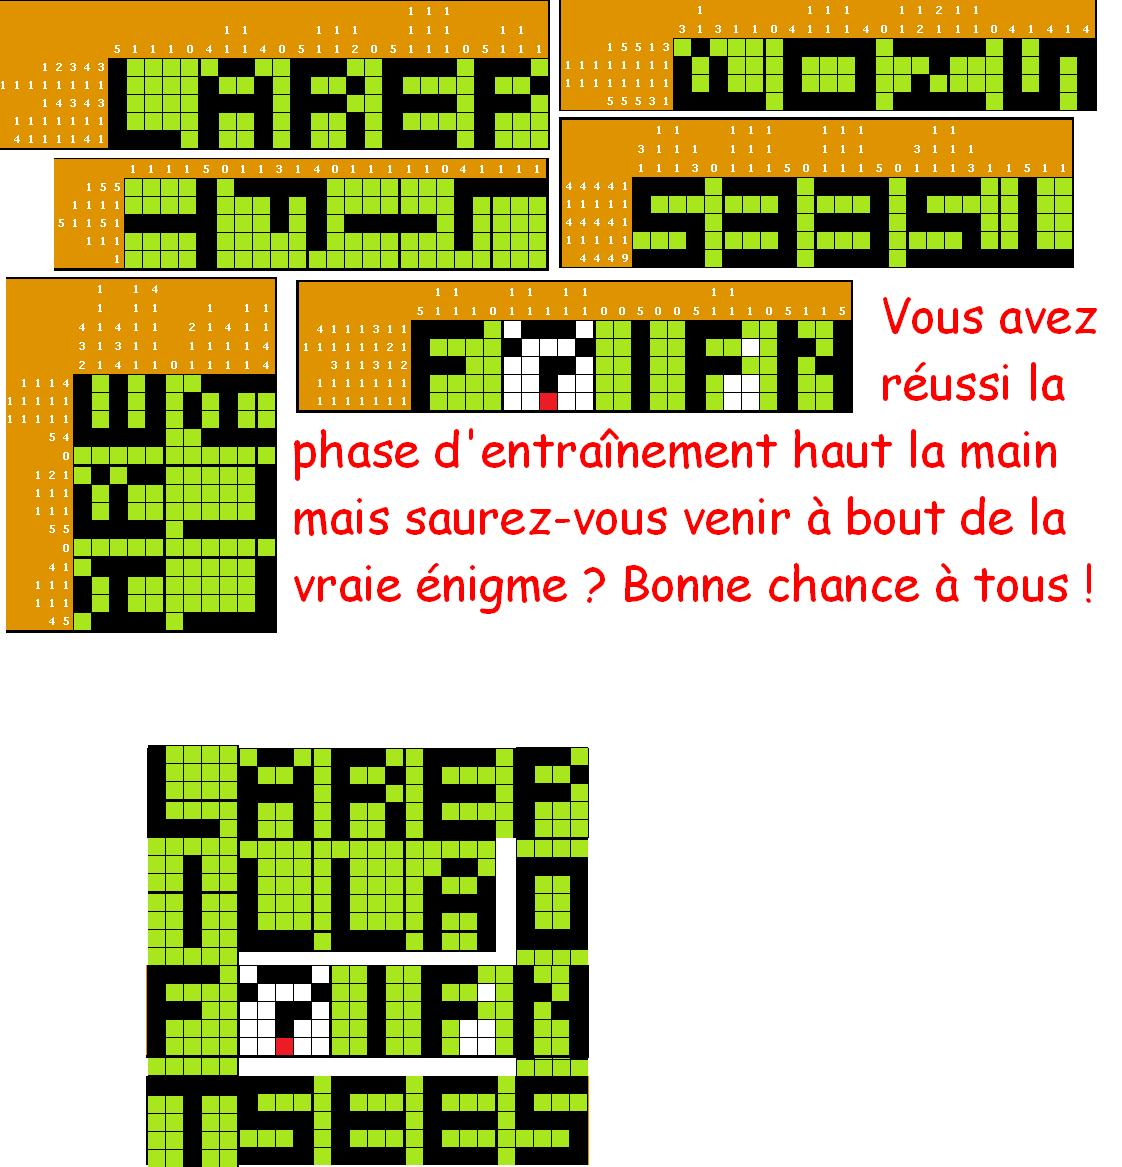 http://www.prise2tete.fr/upload/gwen27-cryptoban7.jpg